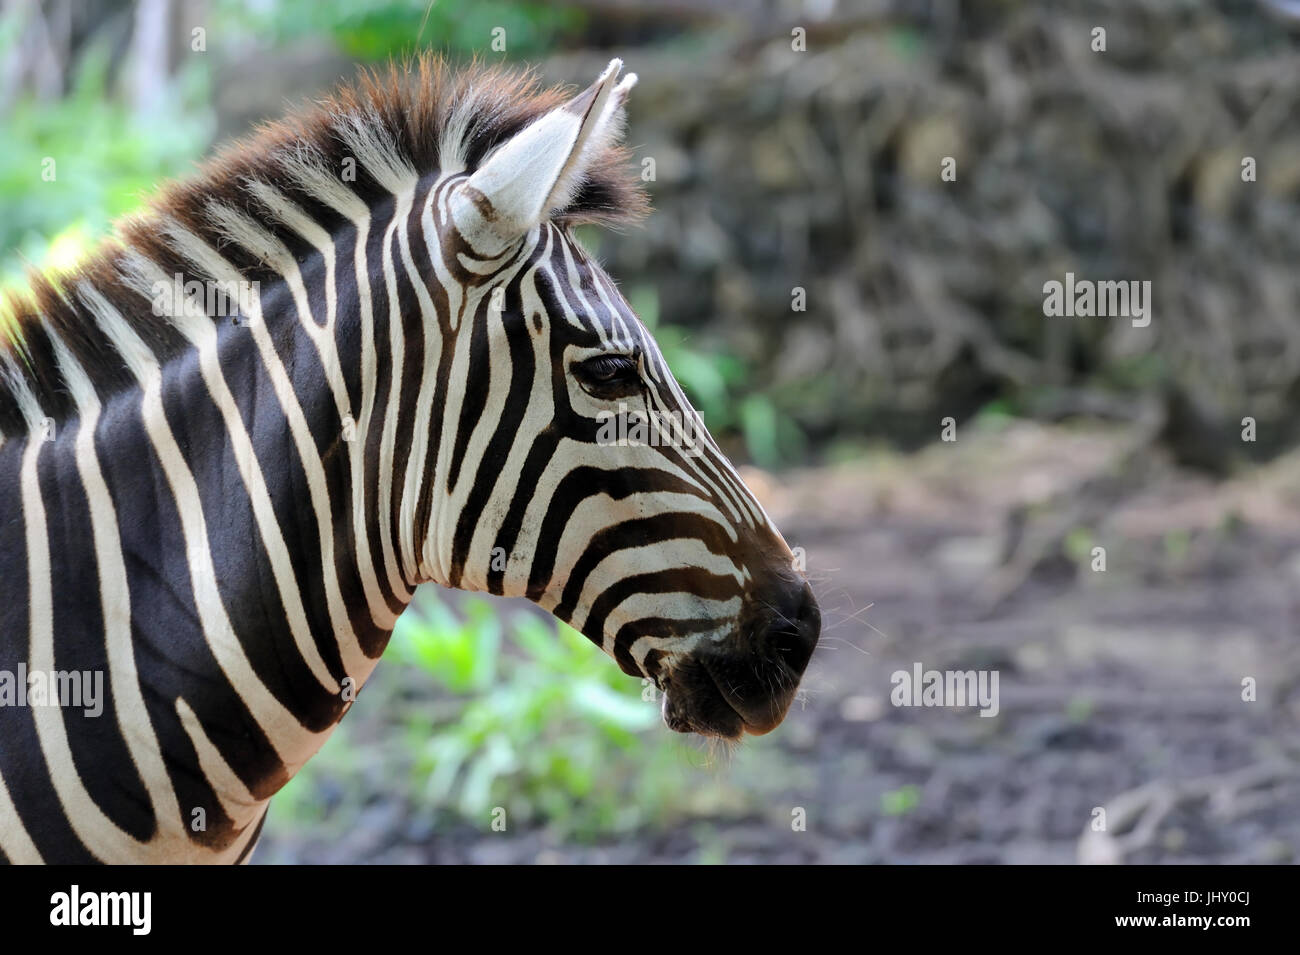 Zebra on grassland in Africa, National park of Kenya - Stock Image